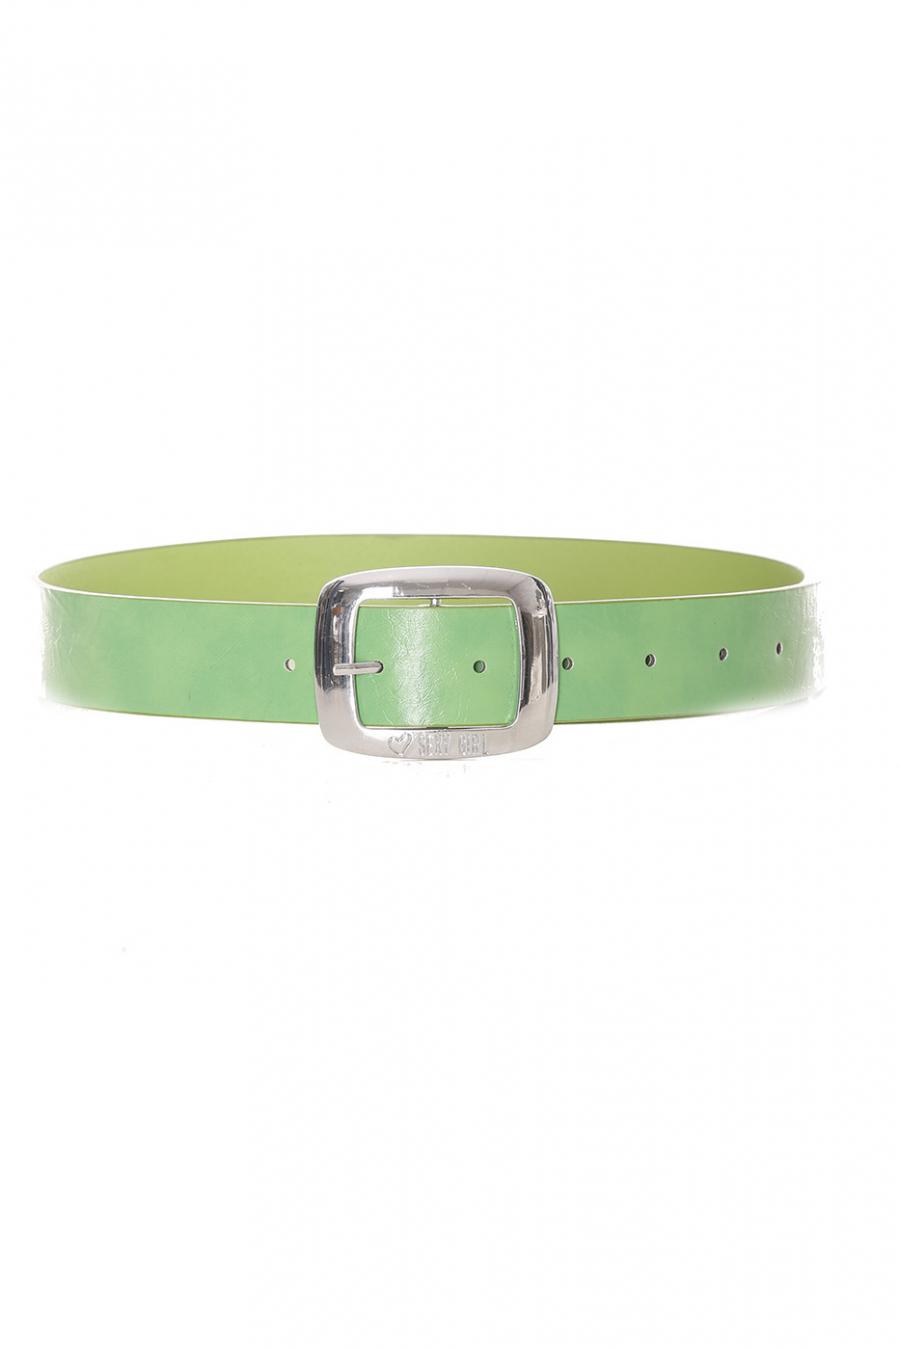 Basic groene effen groene riem - D7358